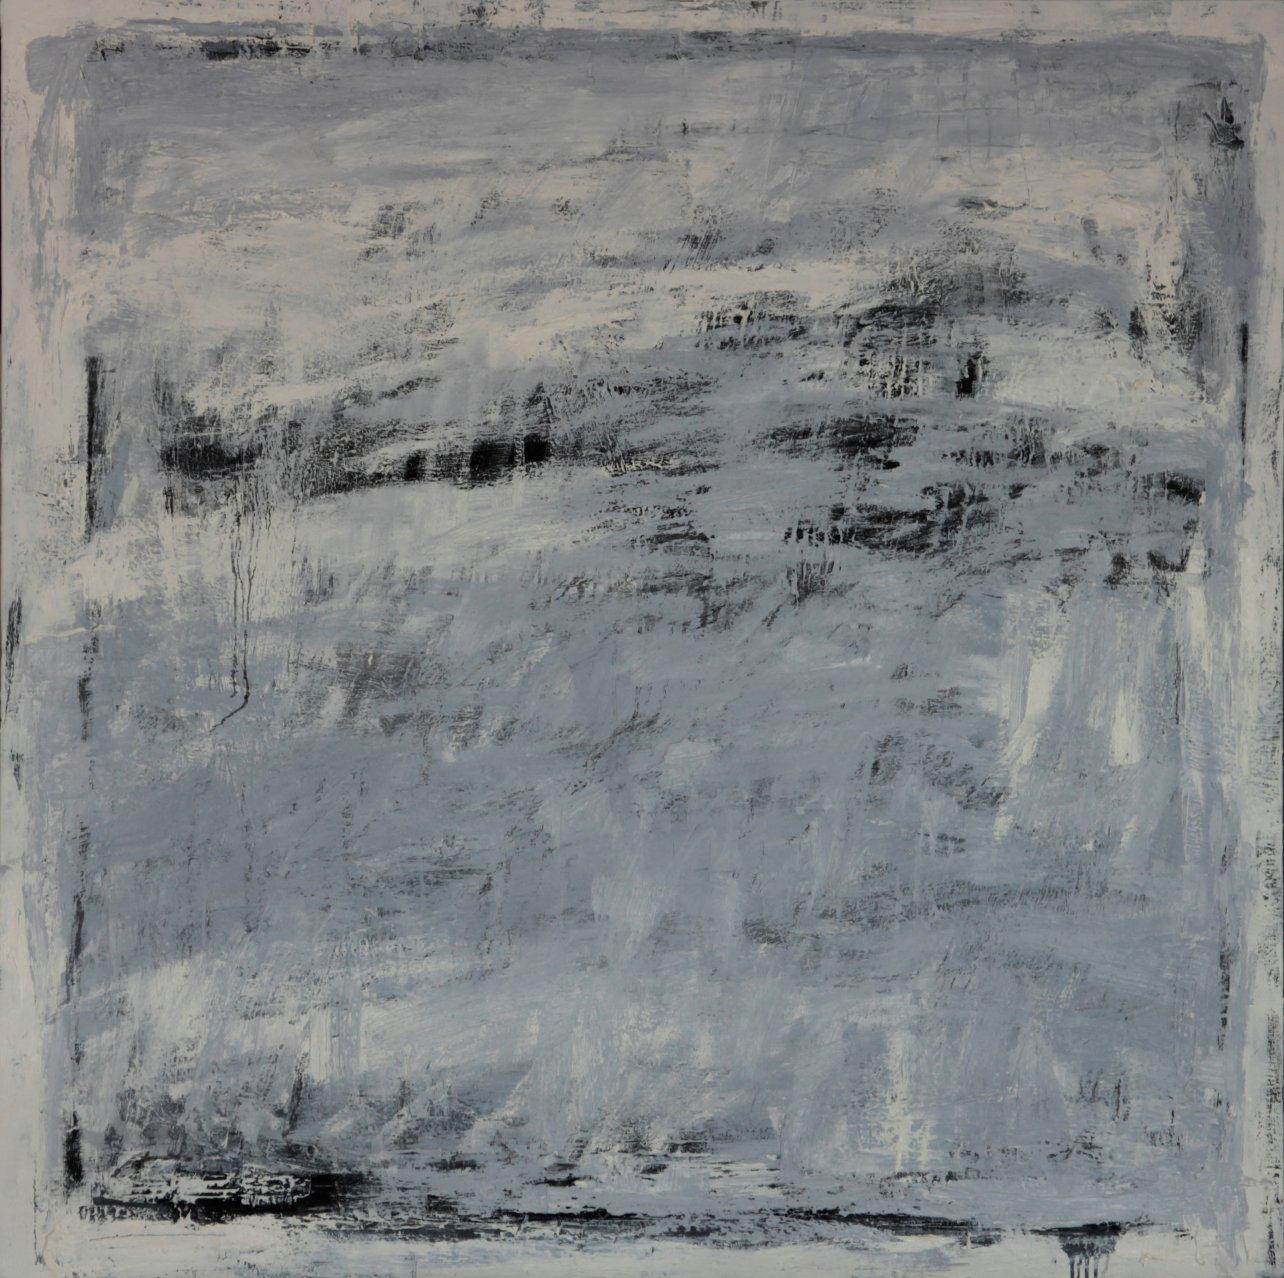 junco suite I (2015) - Pablo Lanuza